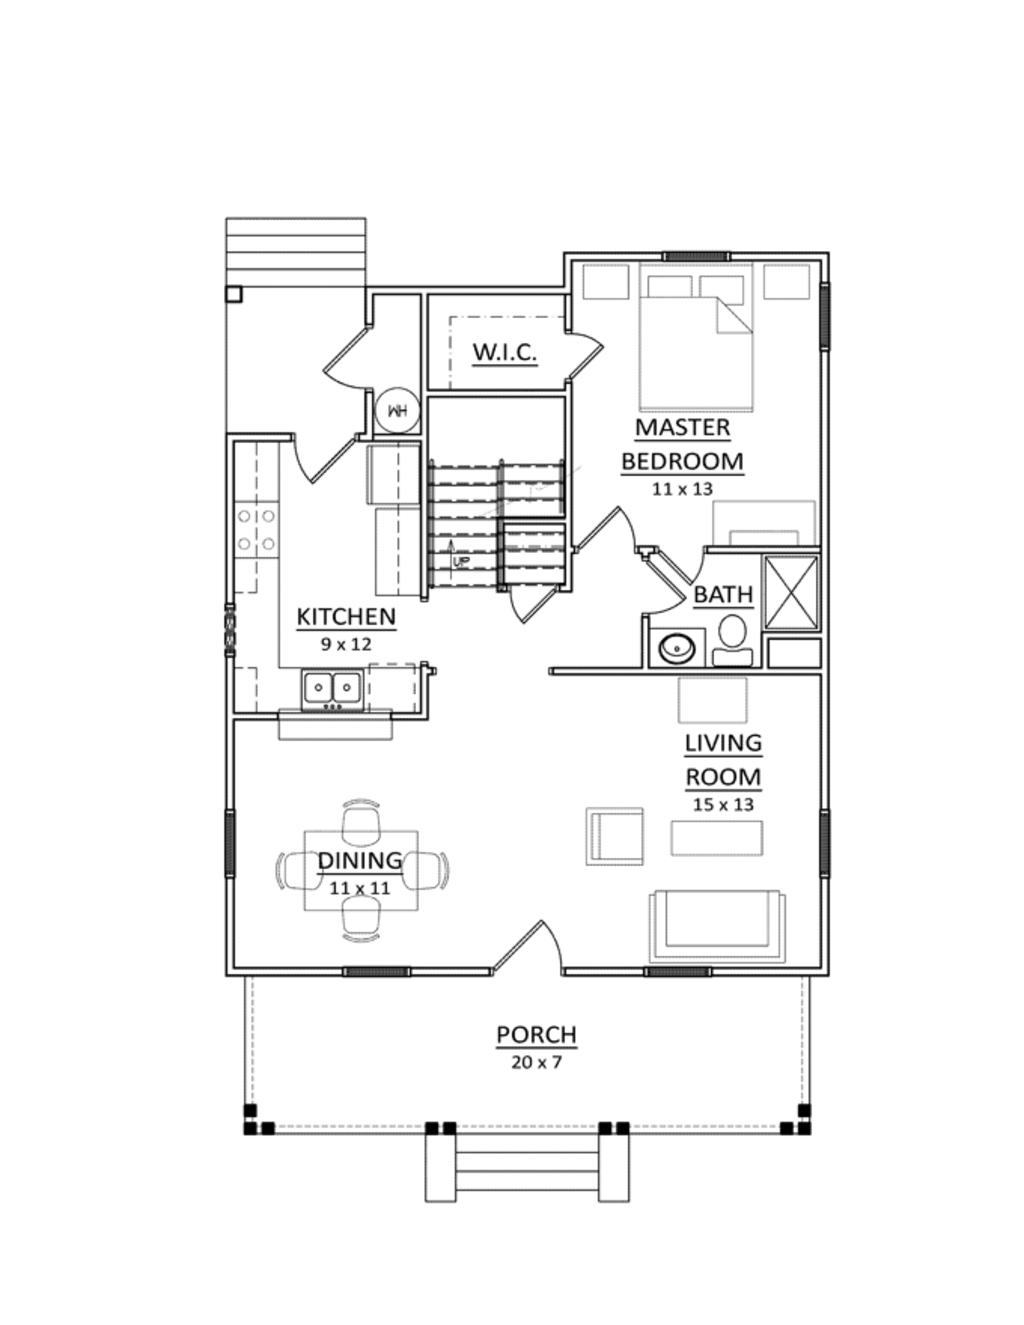 Fantastic Craftsman Style House Plan 3 Beds 2 Baths 1210 Sq Ft Plan Download Free Architecture Designs Scobabritishbridgeorg